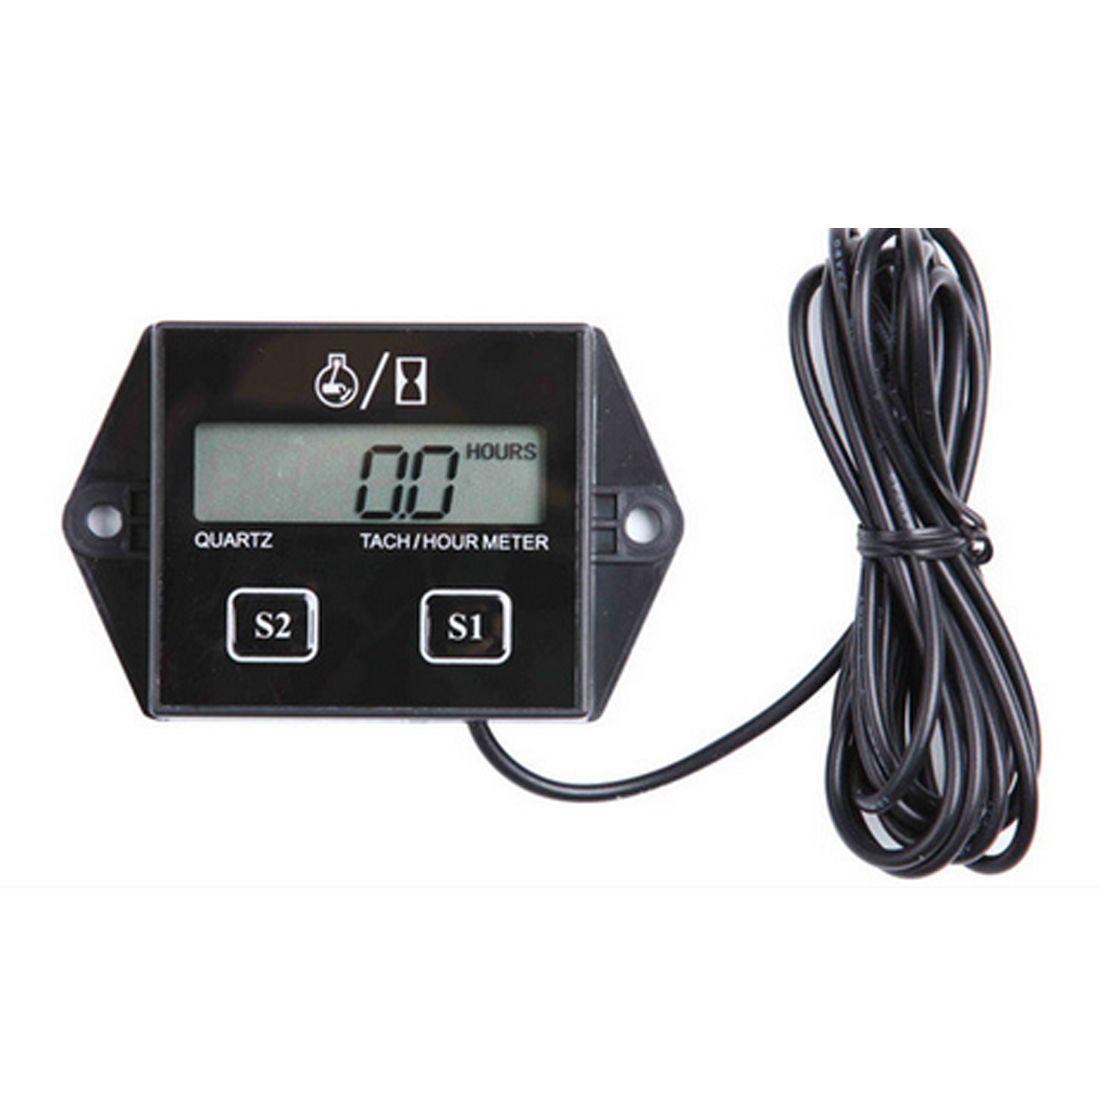 LCD Display Tachometer RPM Tacho Tach Gauge Spin Digitaler Tachometer Motor Tach Stunde Meter Für Auto Boot Motorrad